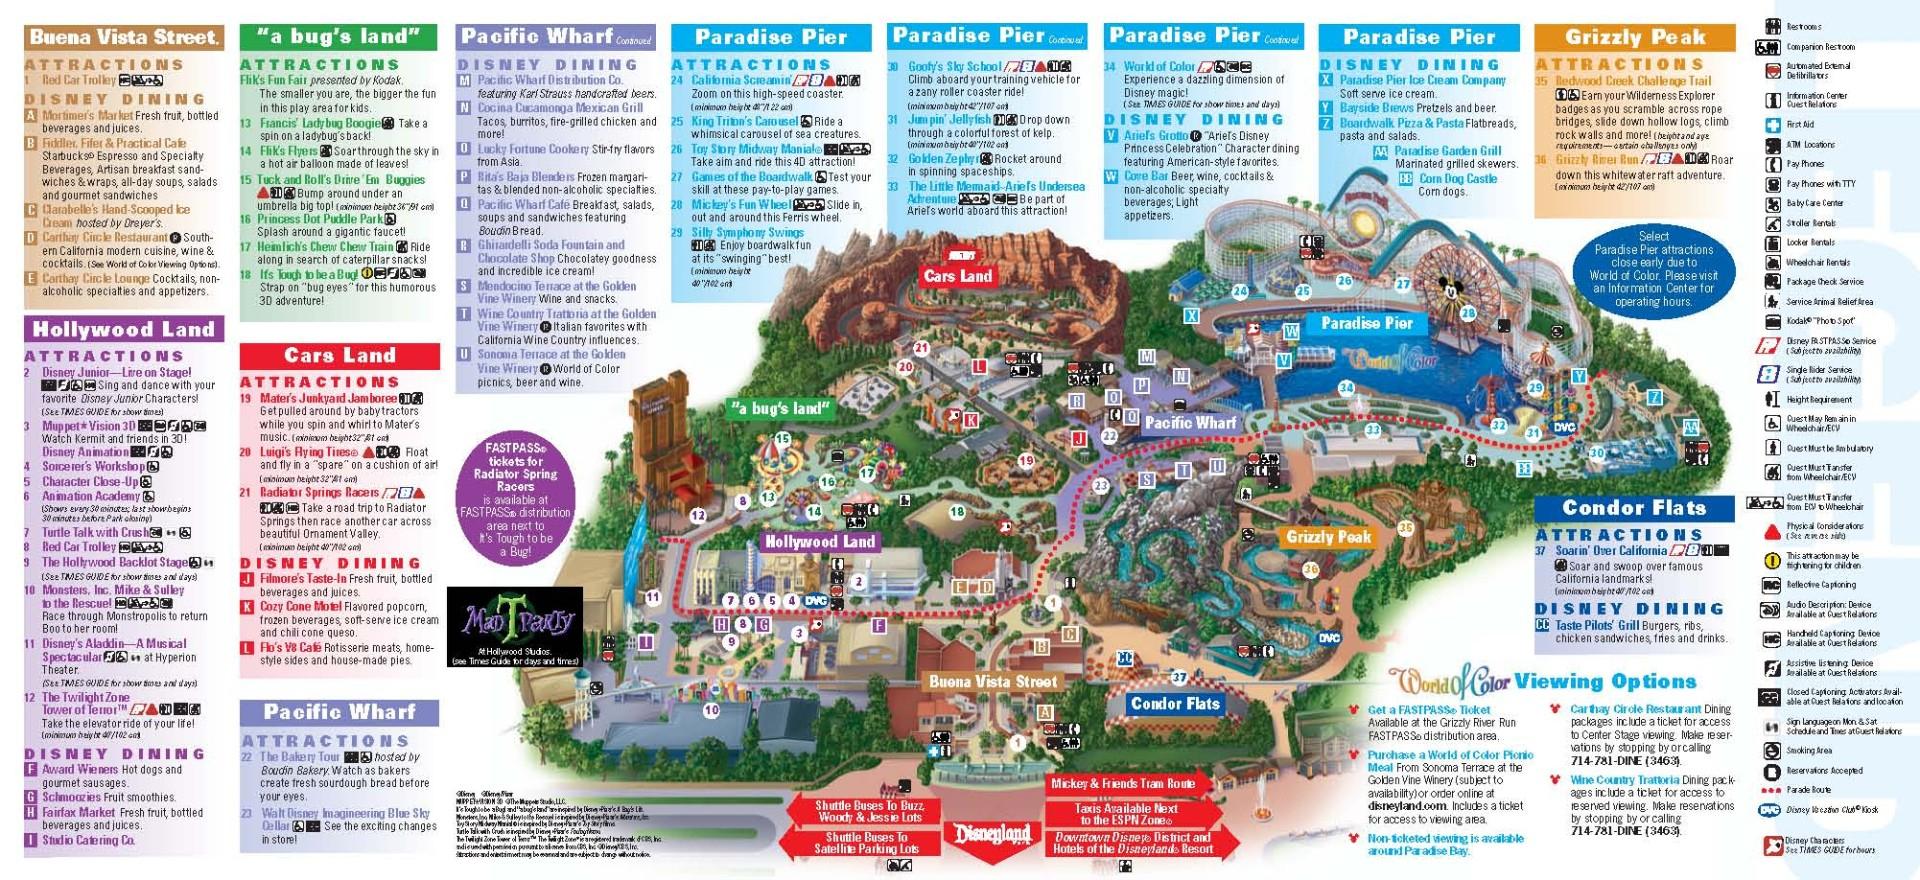 California Adventure Map Pdf - Klipy - California Adventure Map Pdf